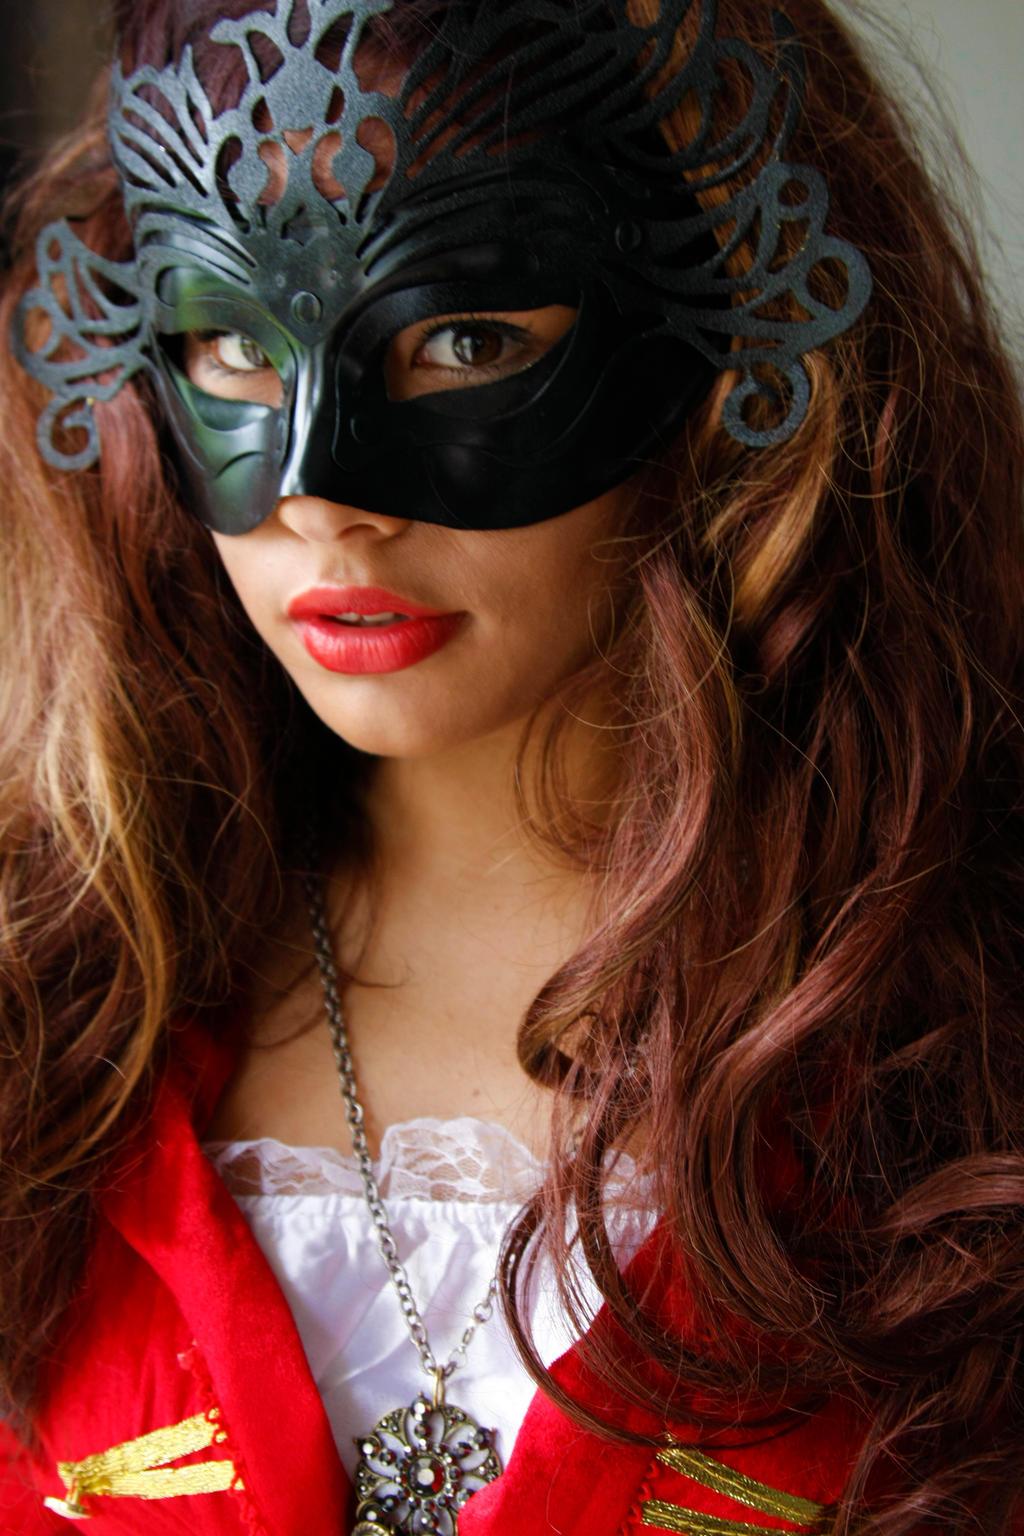 Masked woman 4 by CathleenTarawhiti on DeviantArt